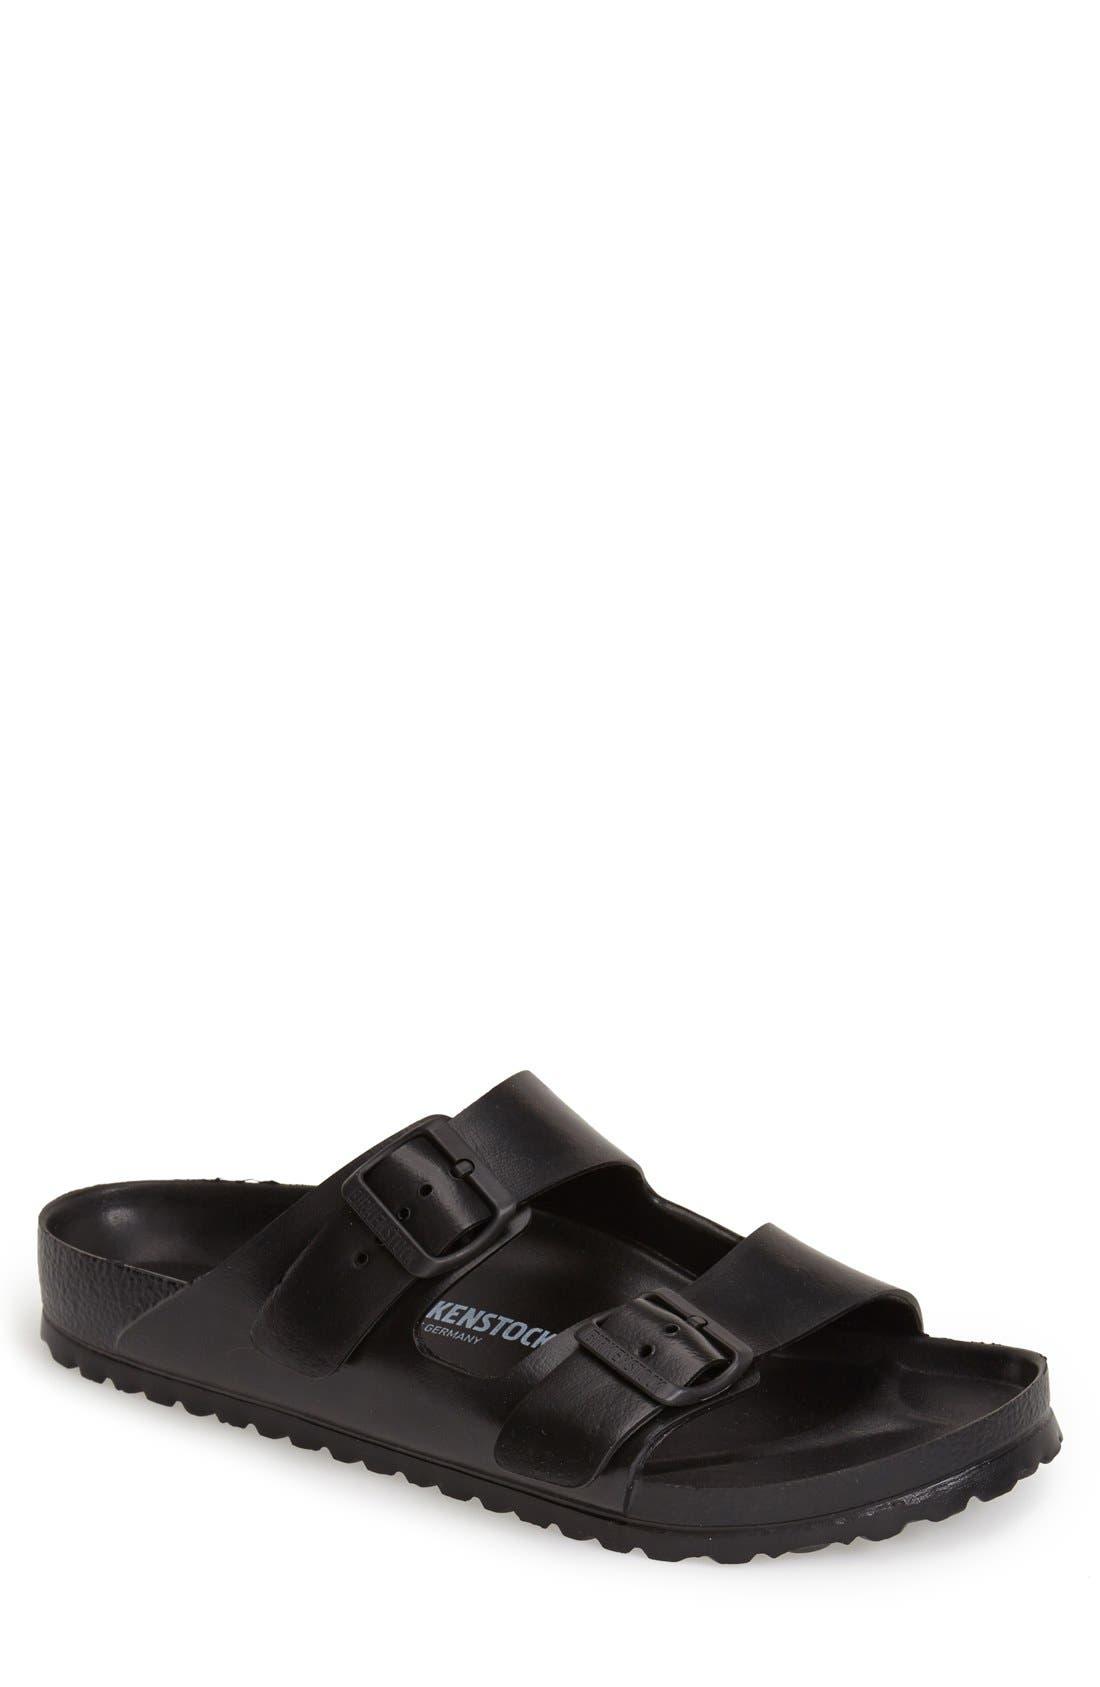 Birkenstock Essentials Arizona Eva Waterproof Slide Sandal,9.5 - Black